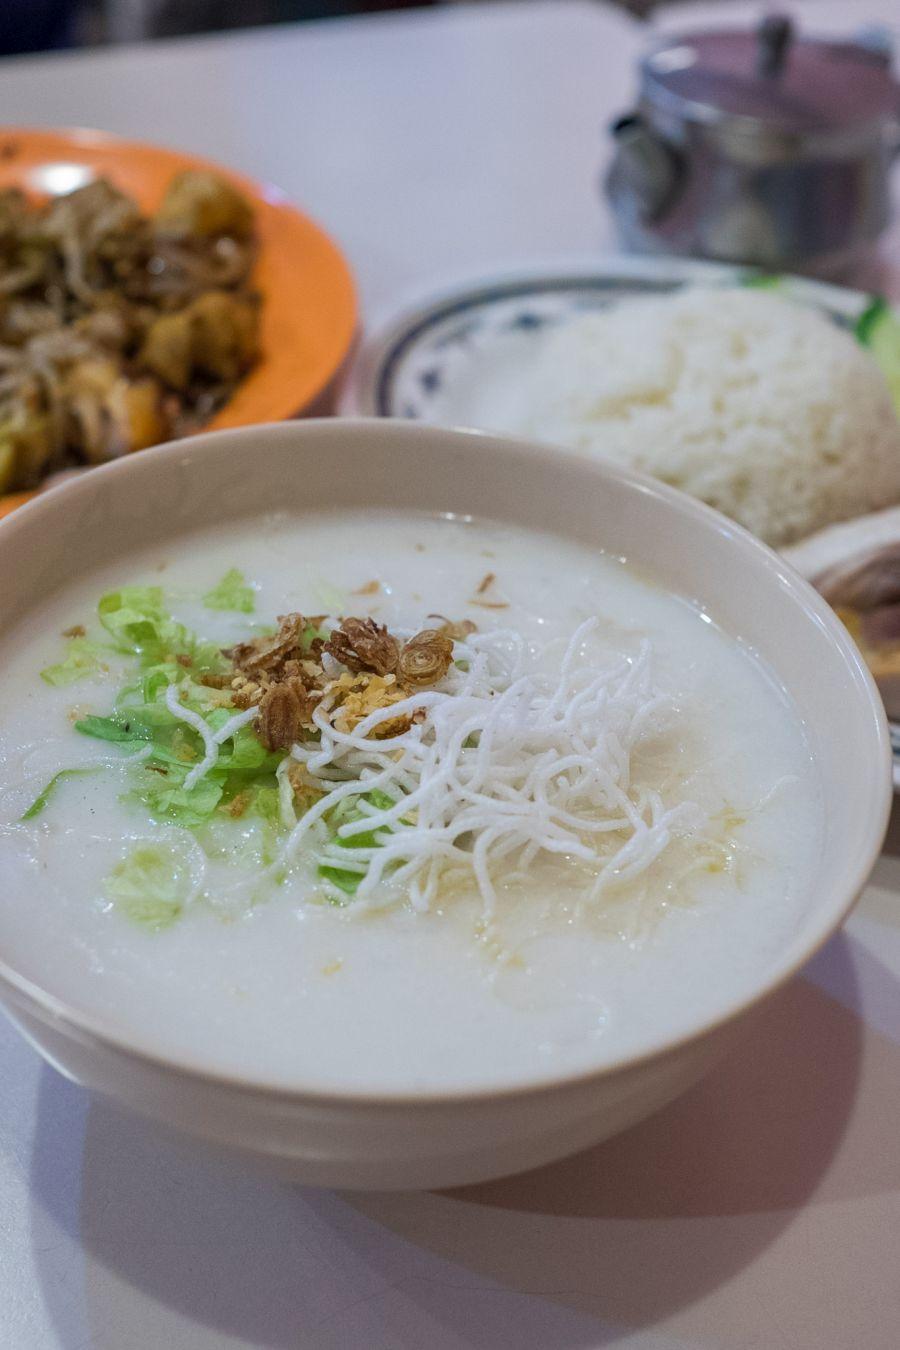 Chicken porridge (AU$7.50) - Cantonese-style rice porridge with shredded chicken